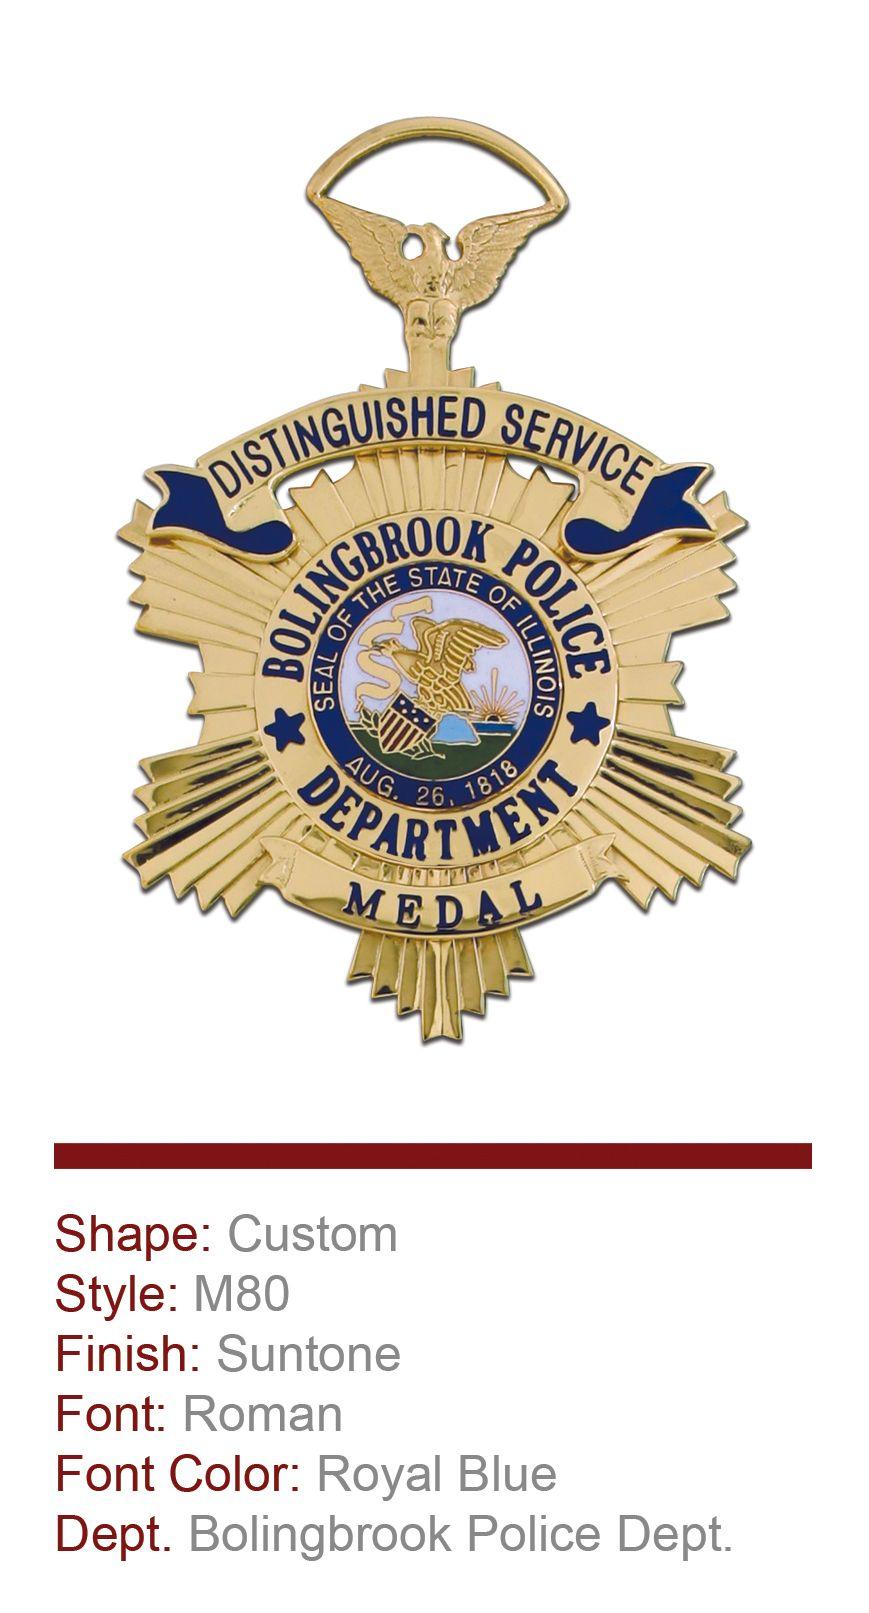 Bolingbrook Police Department